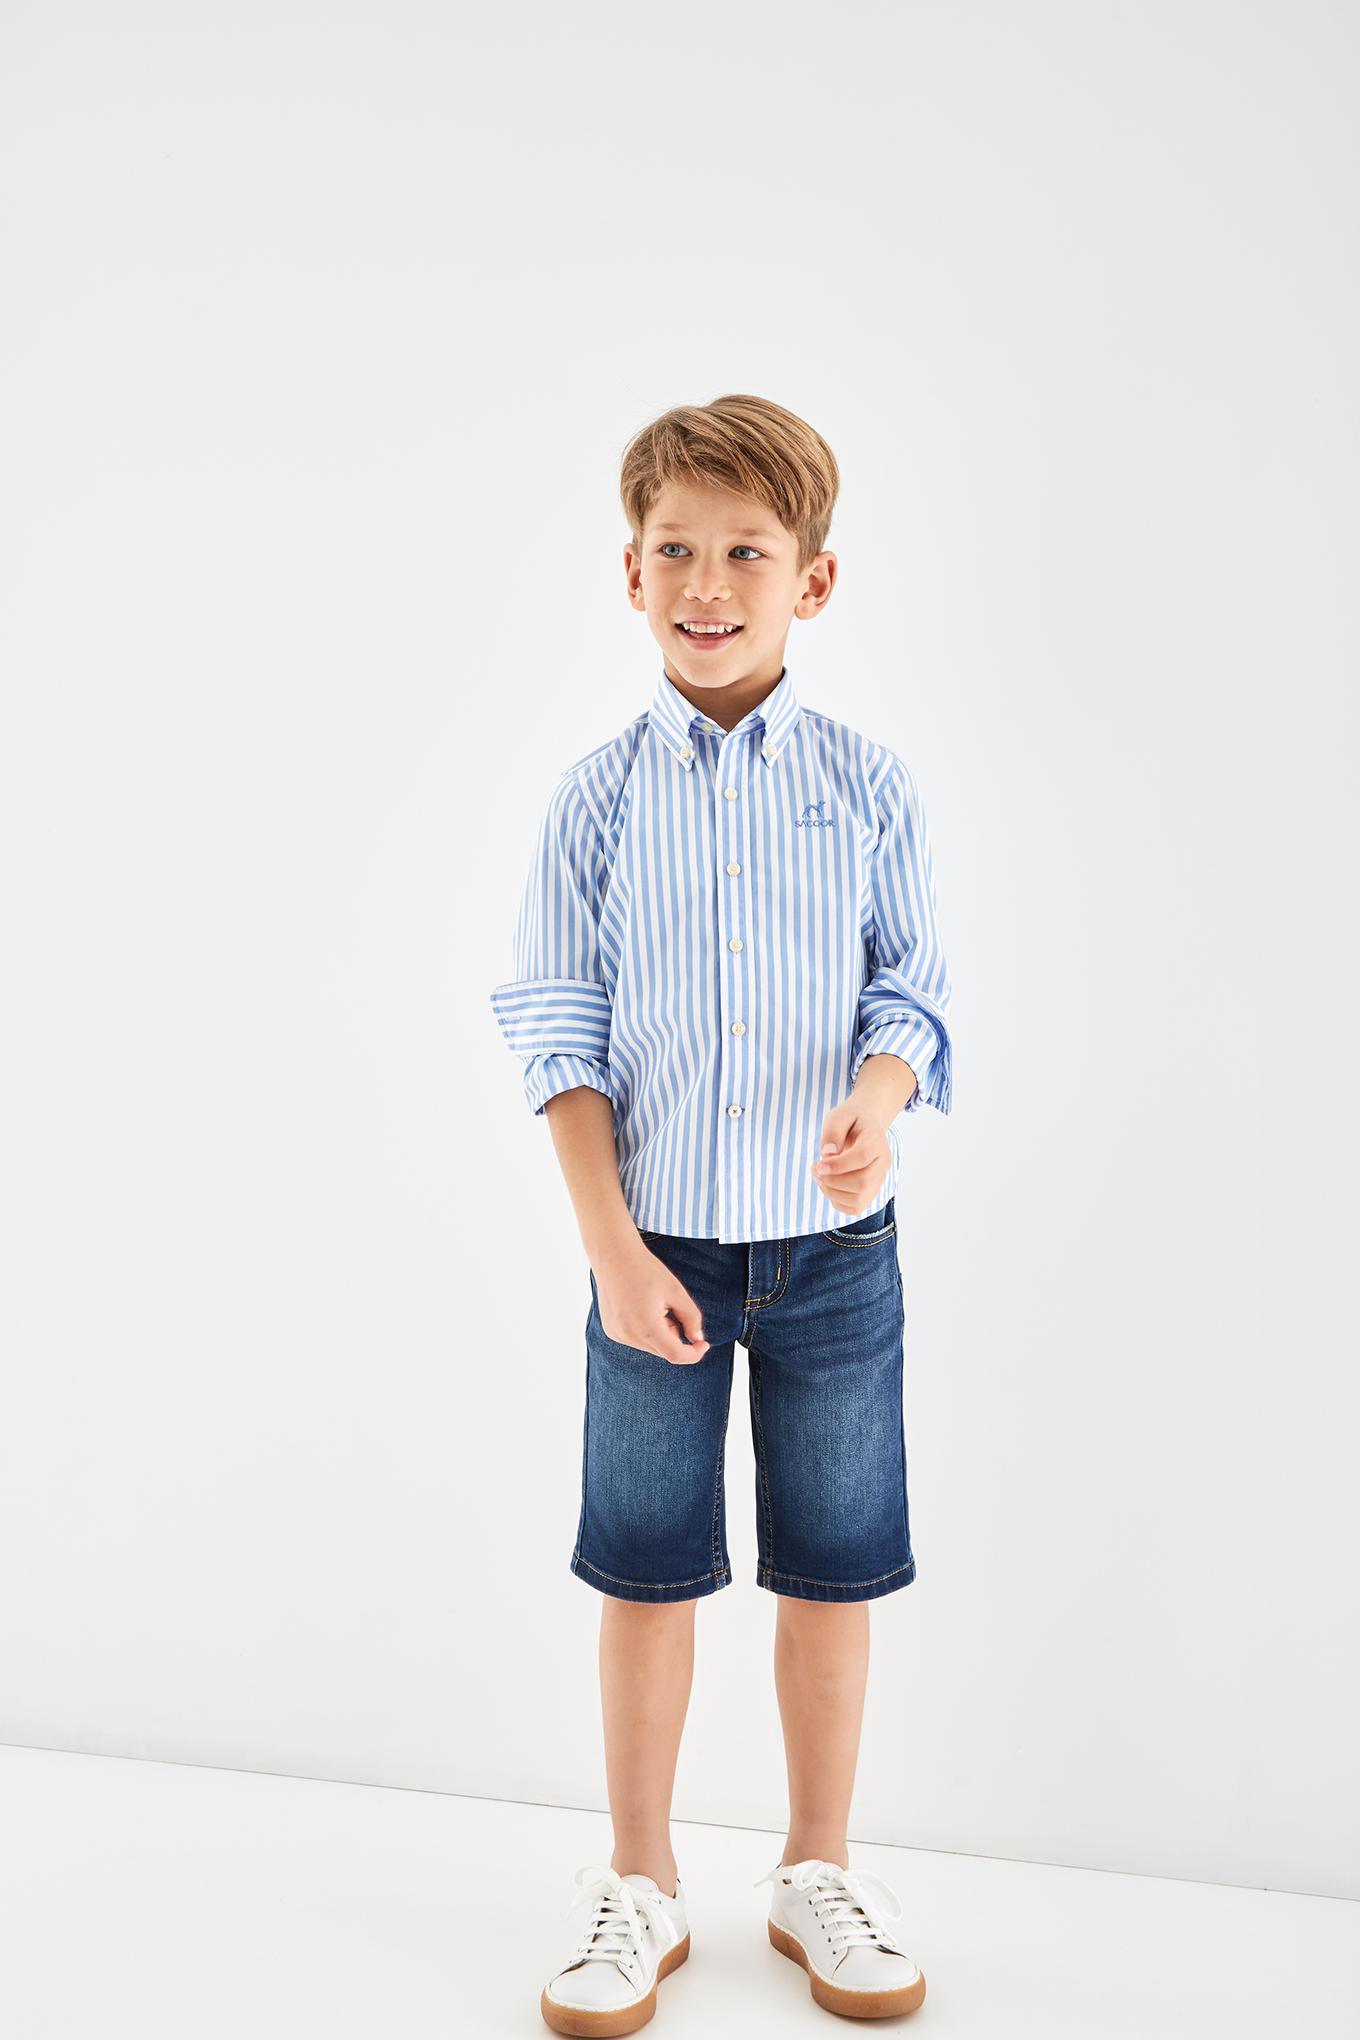 Bermuda Medium Blue Sport Boy